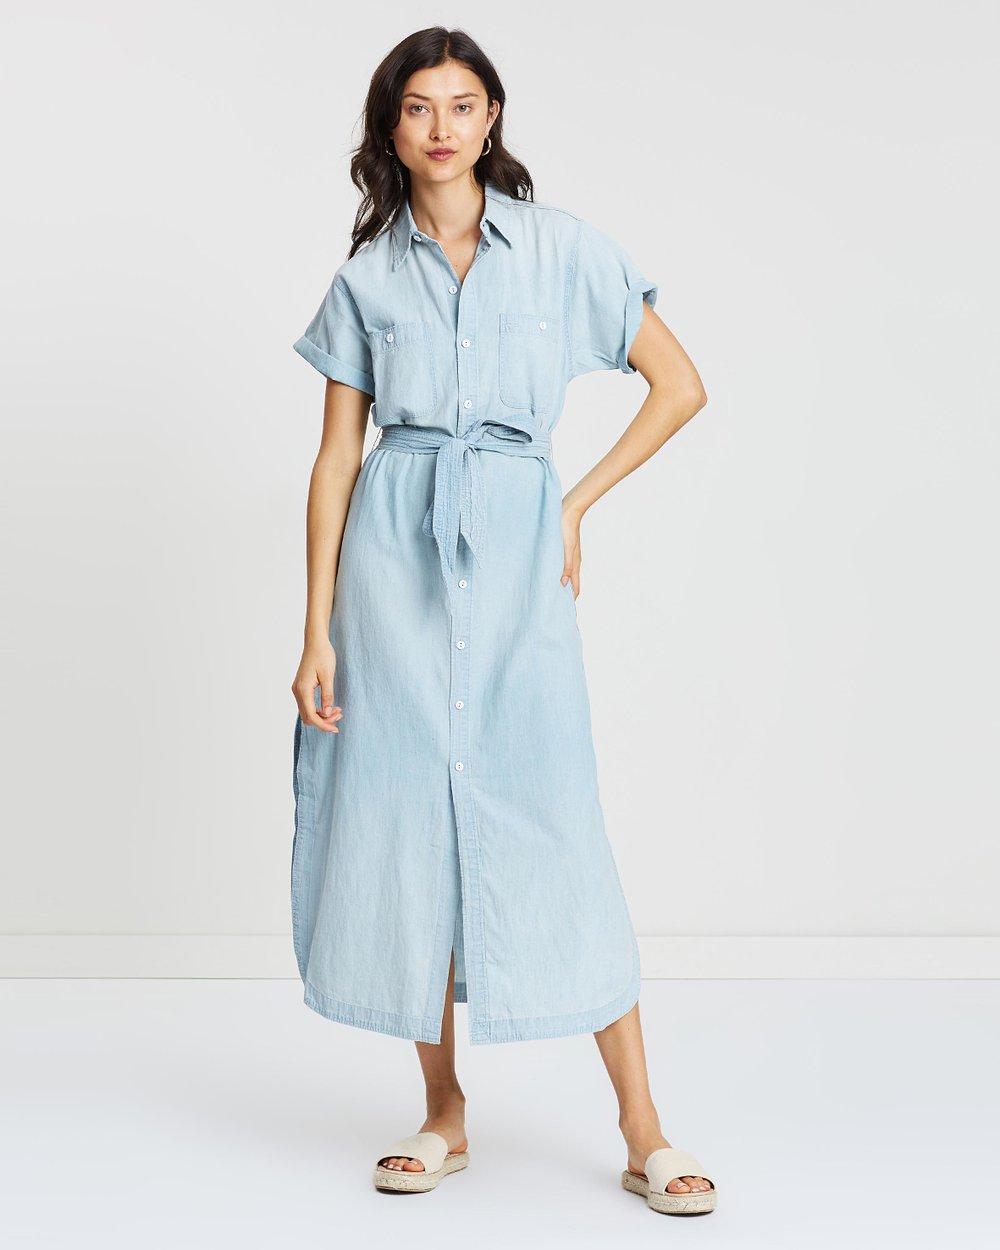 0022563f20 Denim Short Sleeve Maxi Dress by Polo Ralph Lauren Online | THE ICONIC |  Australia